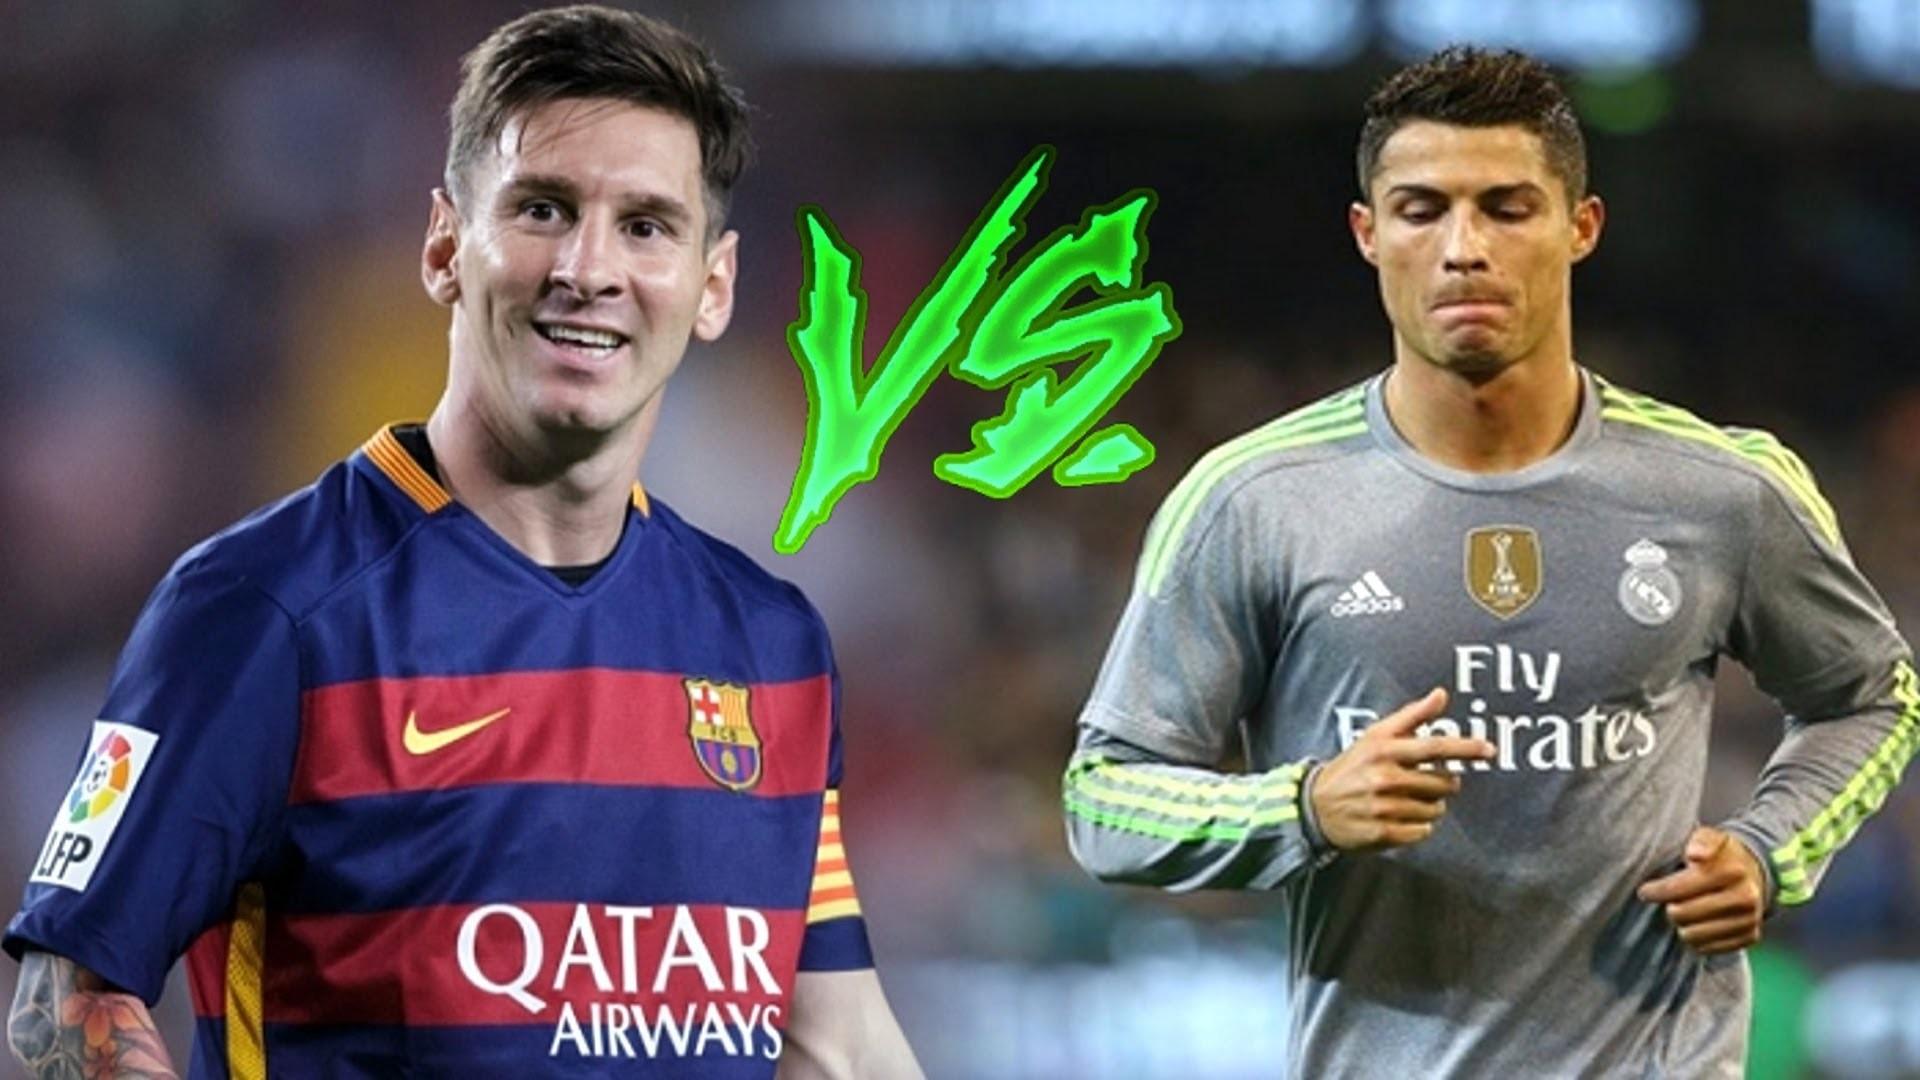 Messi vs Ronaldo Wallpaper HD